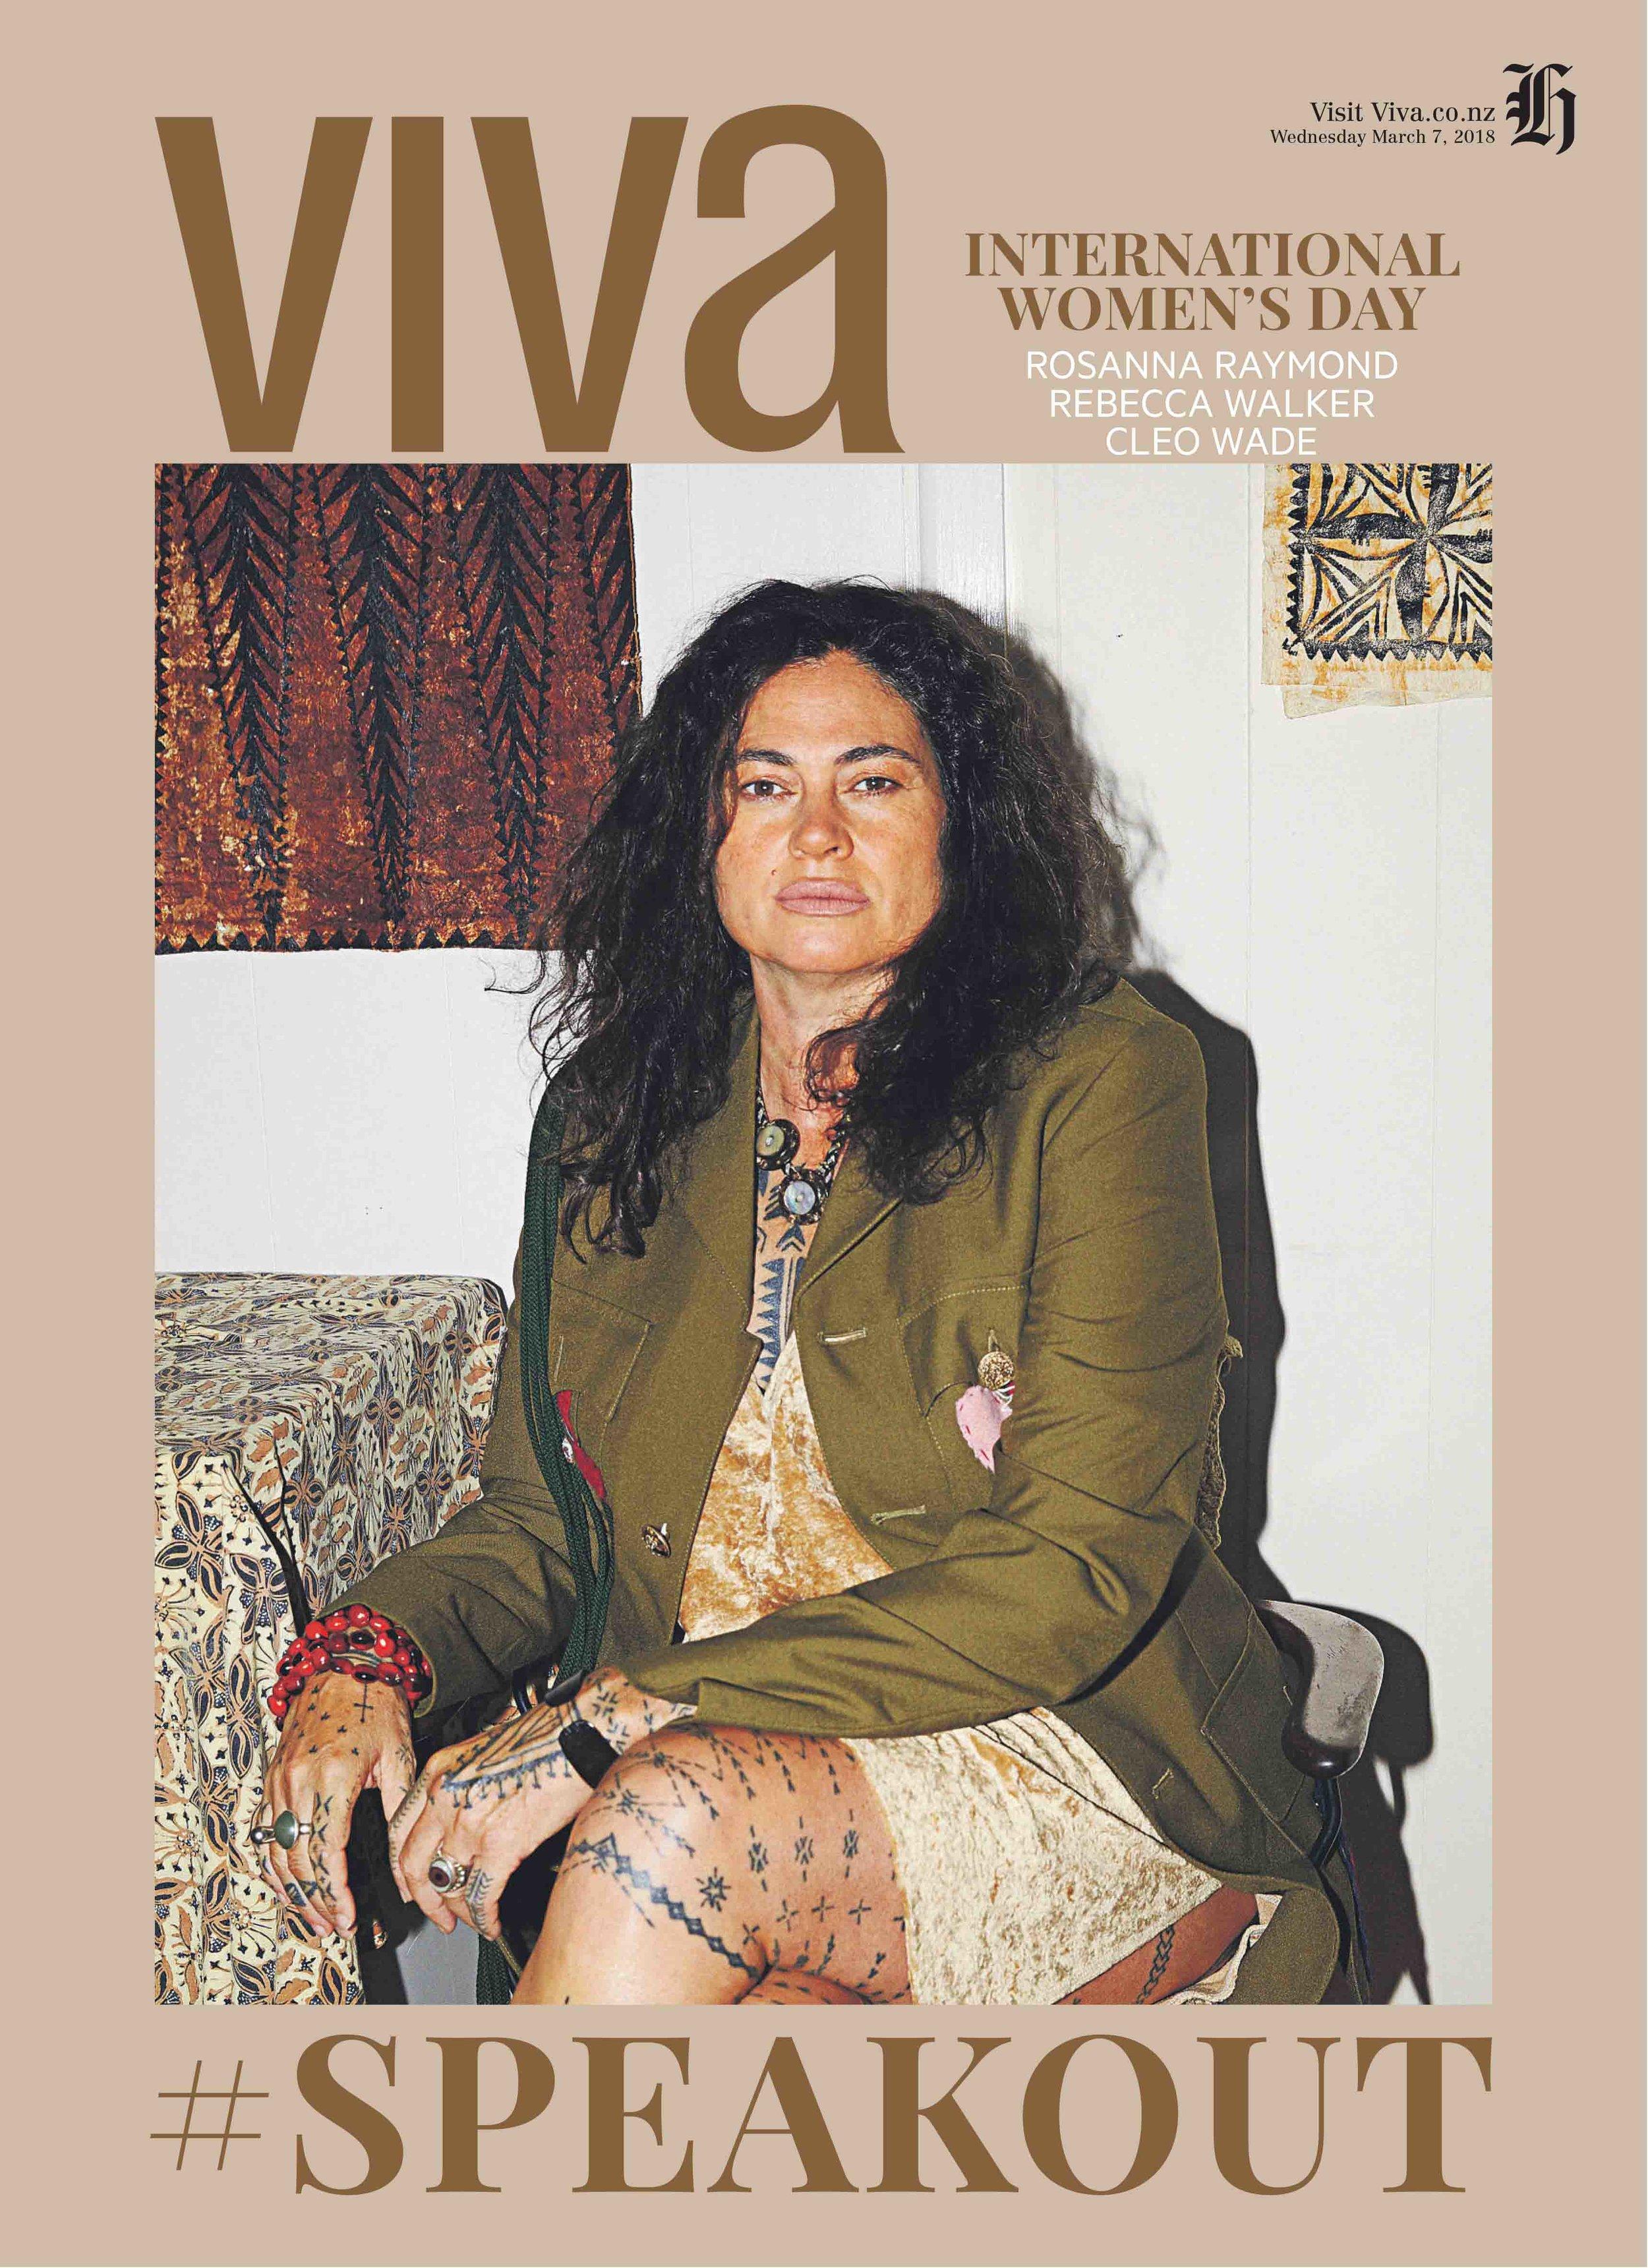 VIVA07MAR18C001.jpg